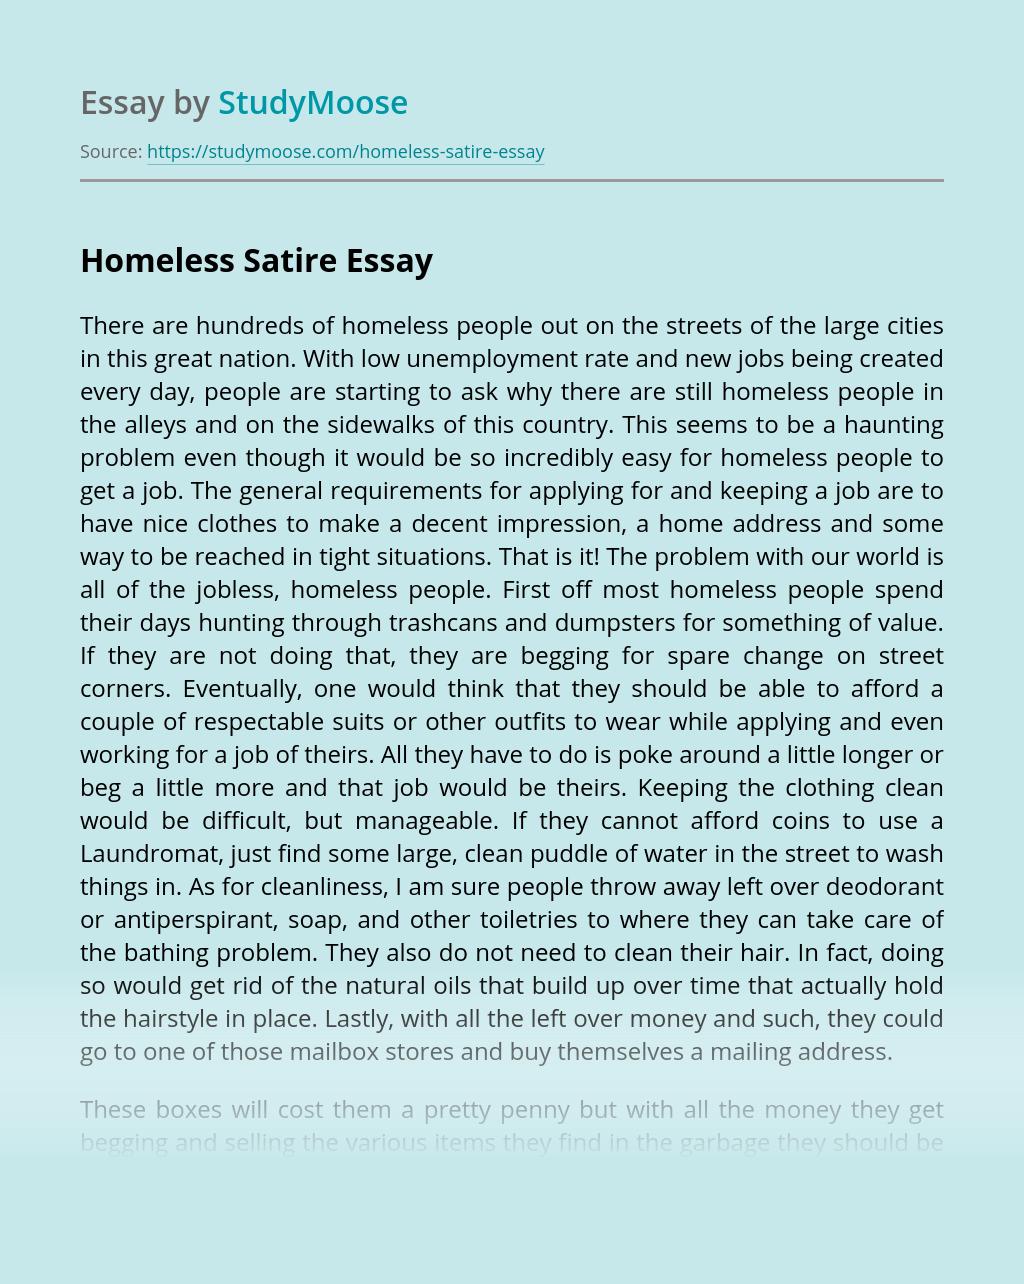 Homeless Satire